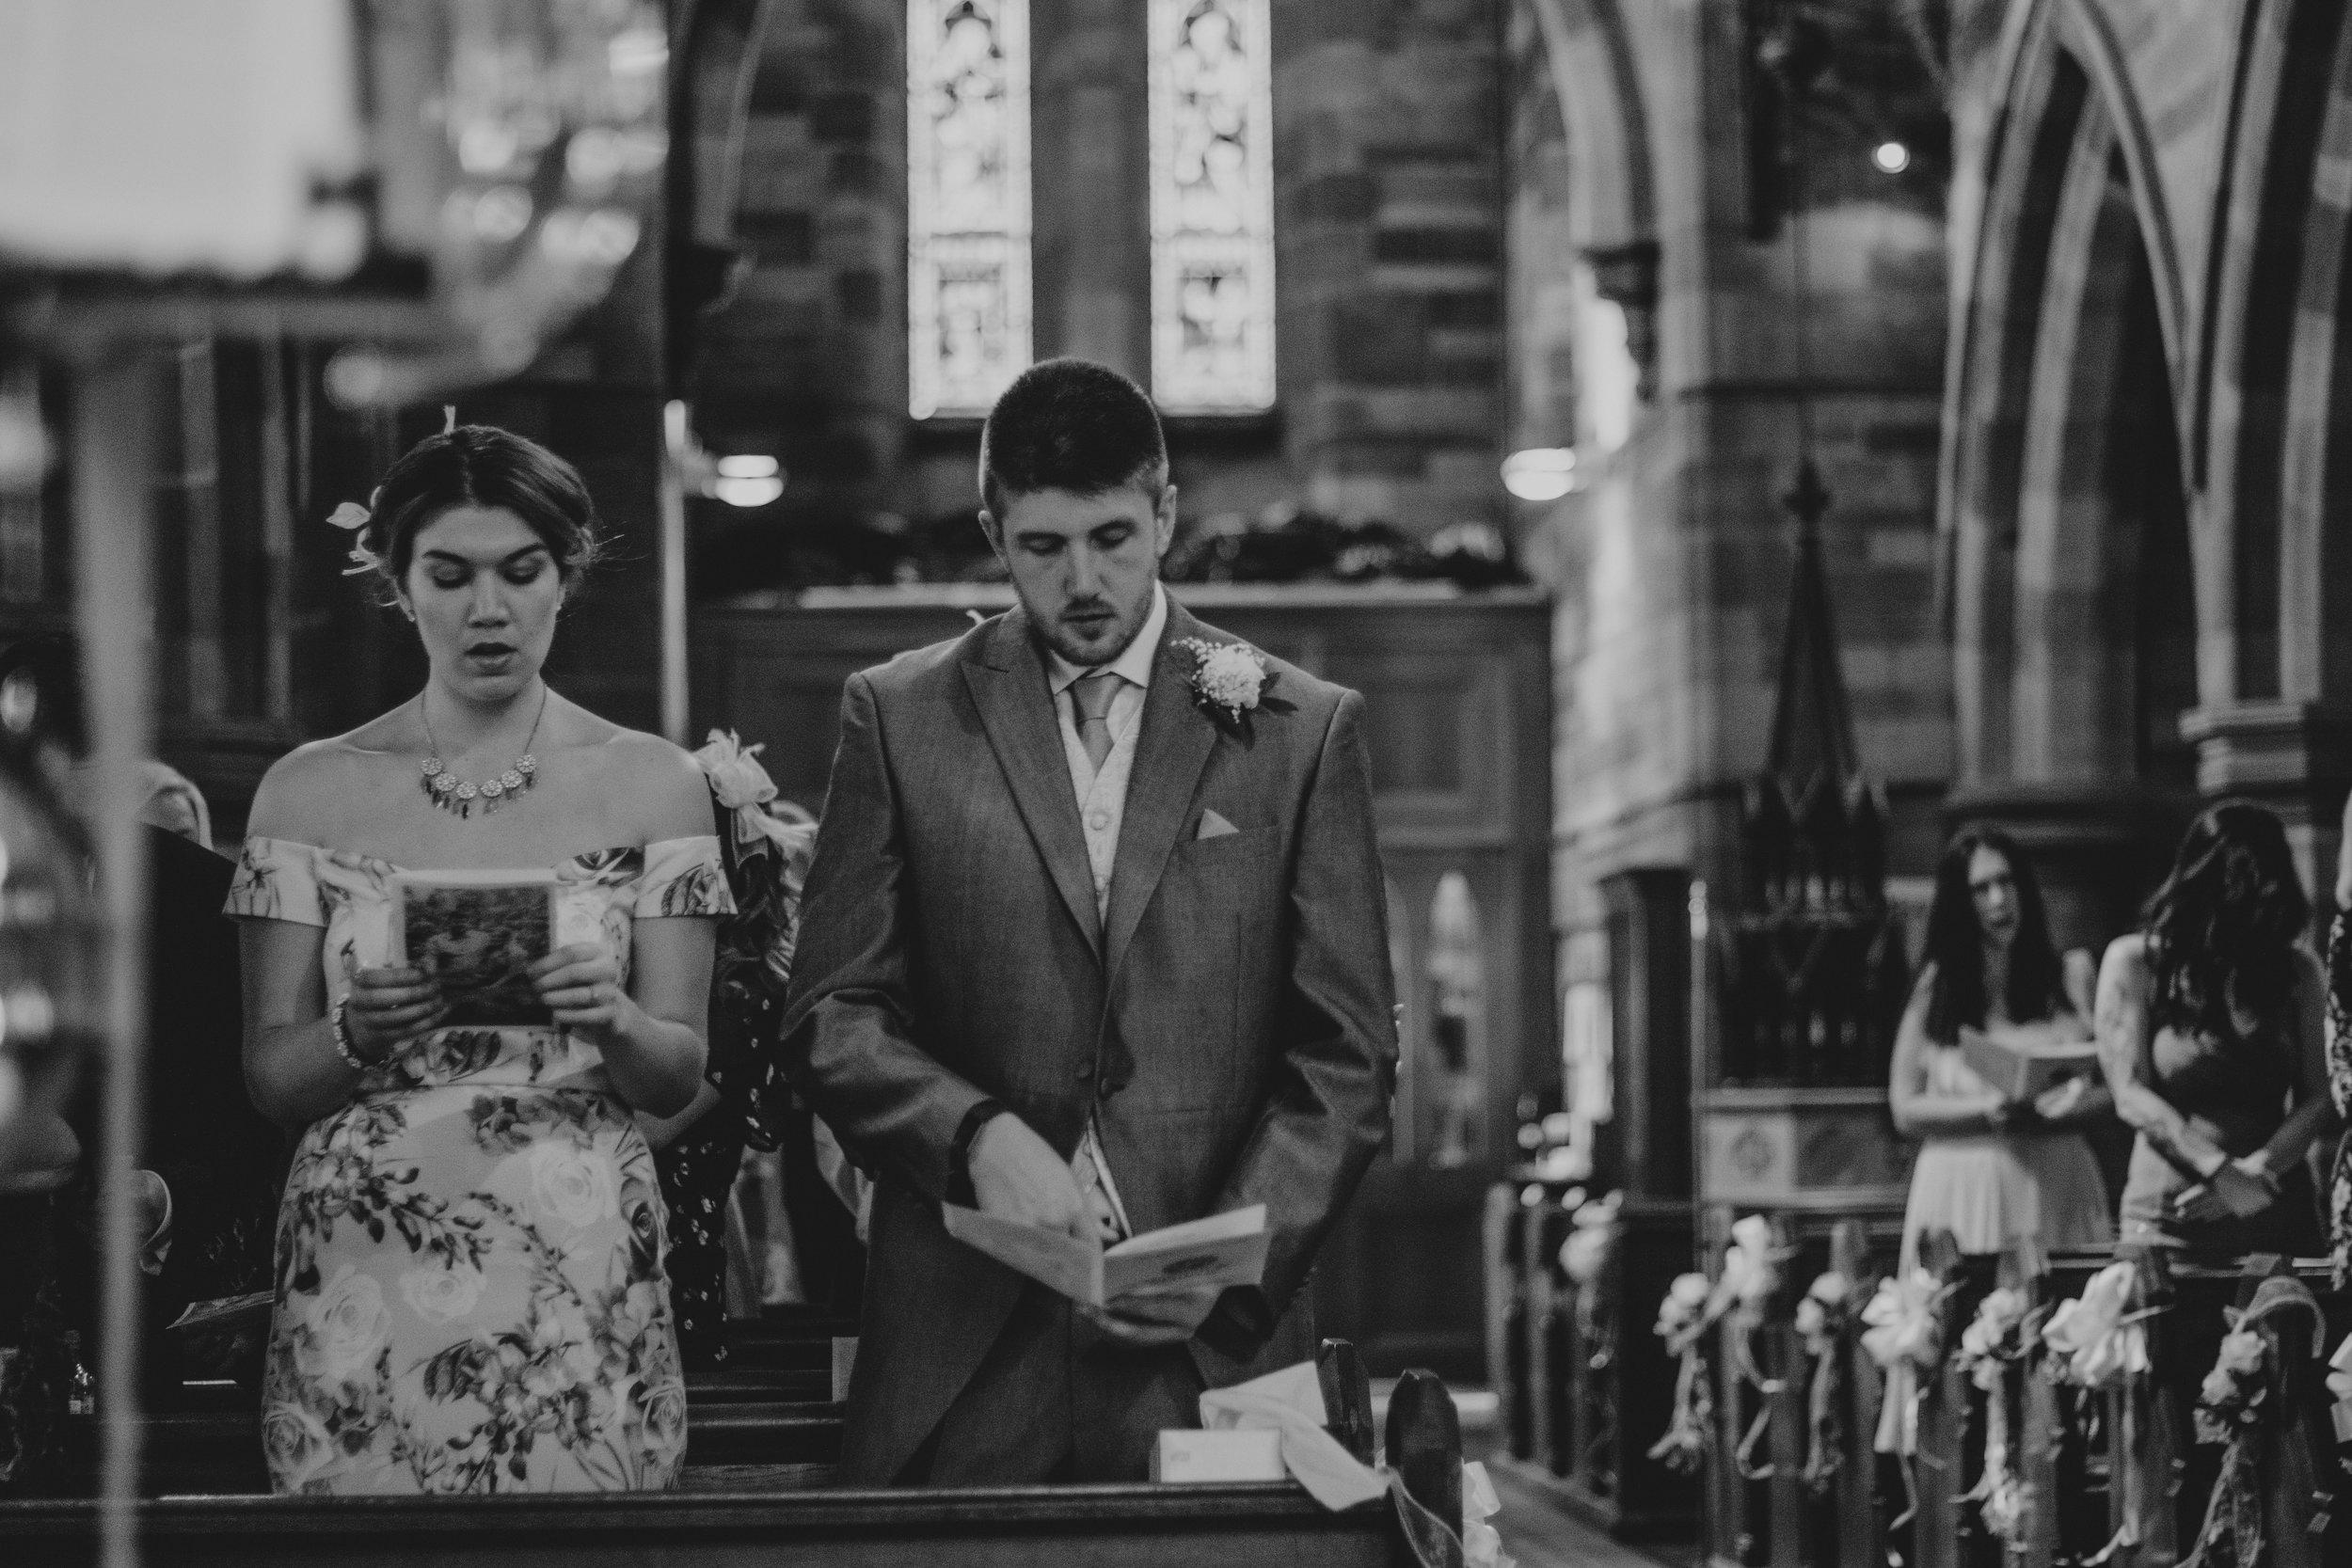 Cheshire wedding Photographer wedding photographer engagement photographer carlisle wedding photographer edinburgh wedding photographer newcastle wedding photographer (1 of 1)-7.jpg